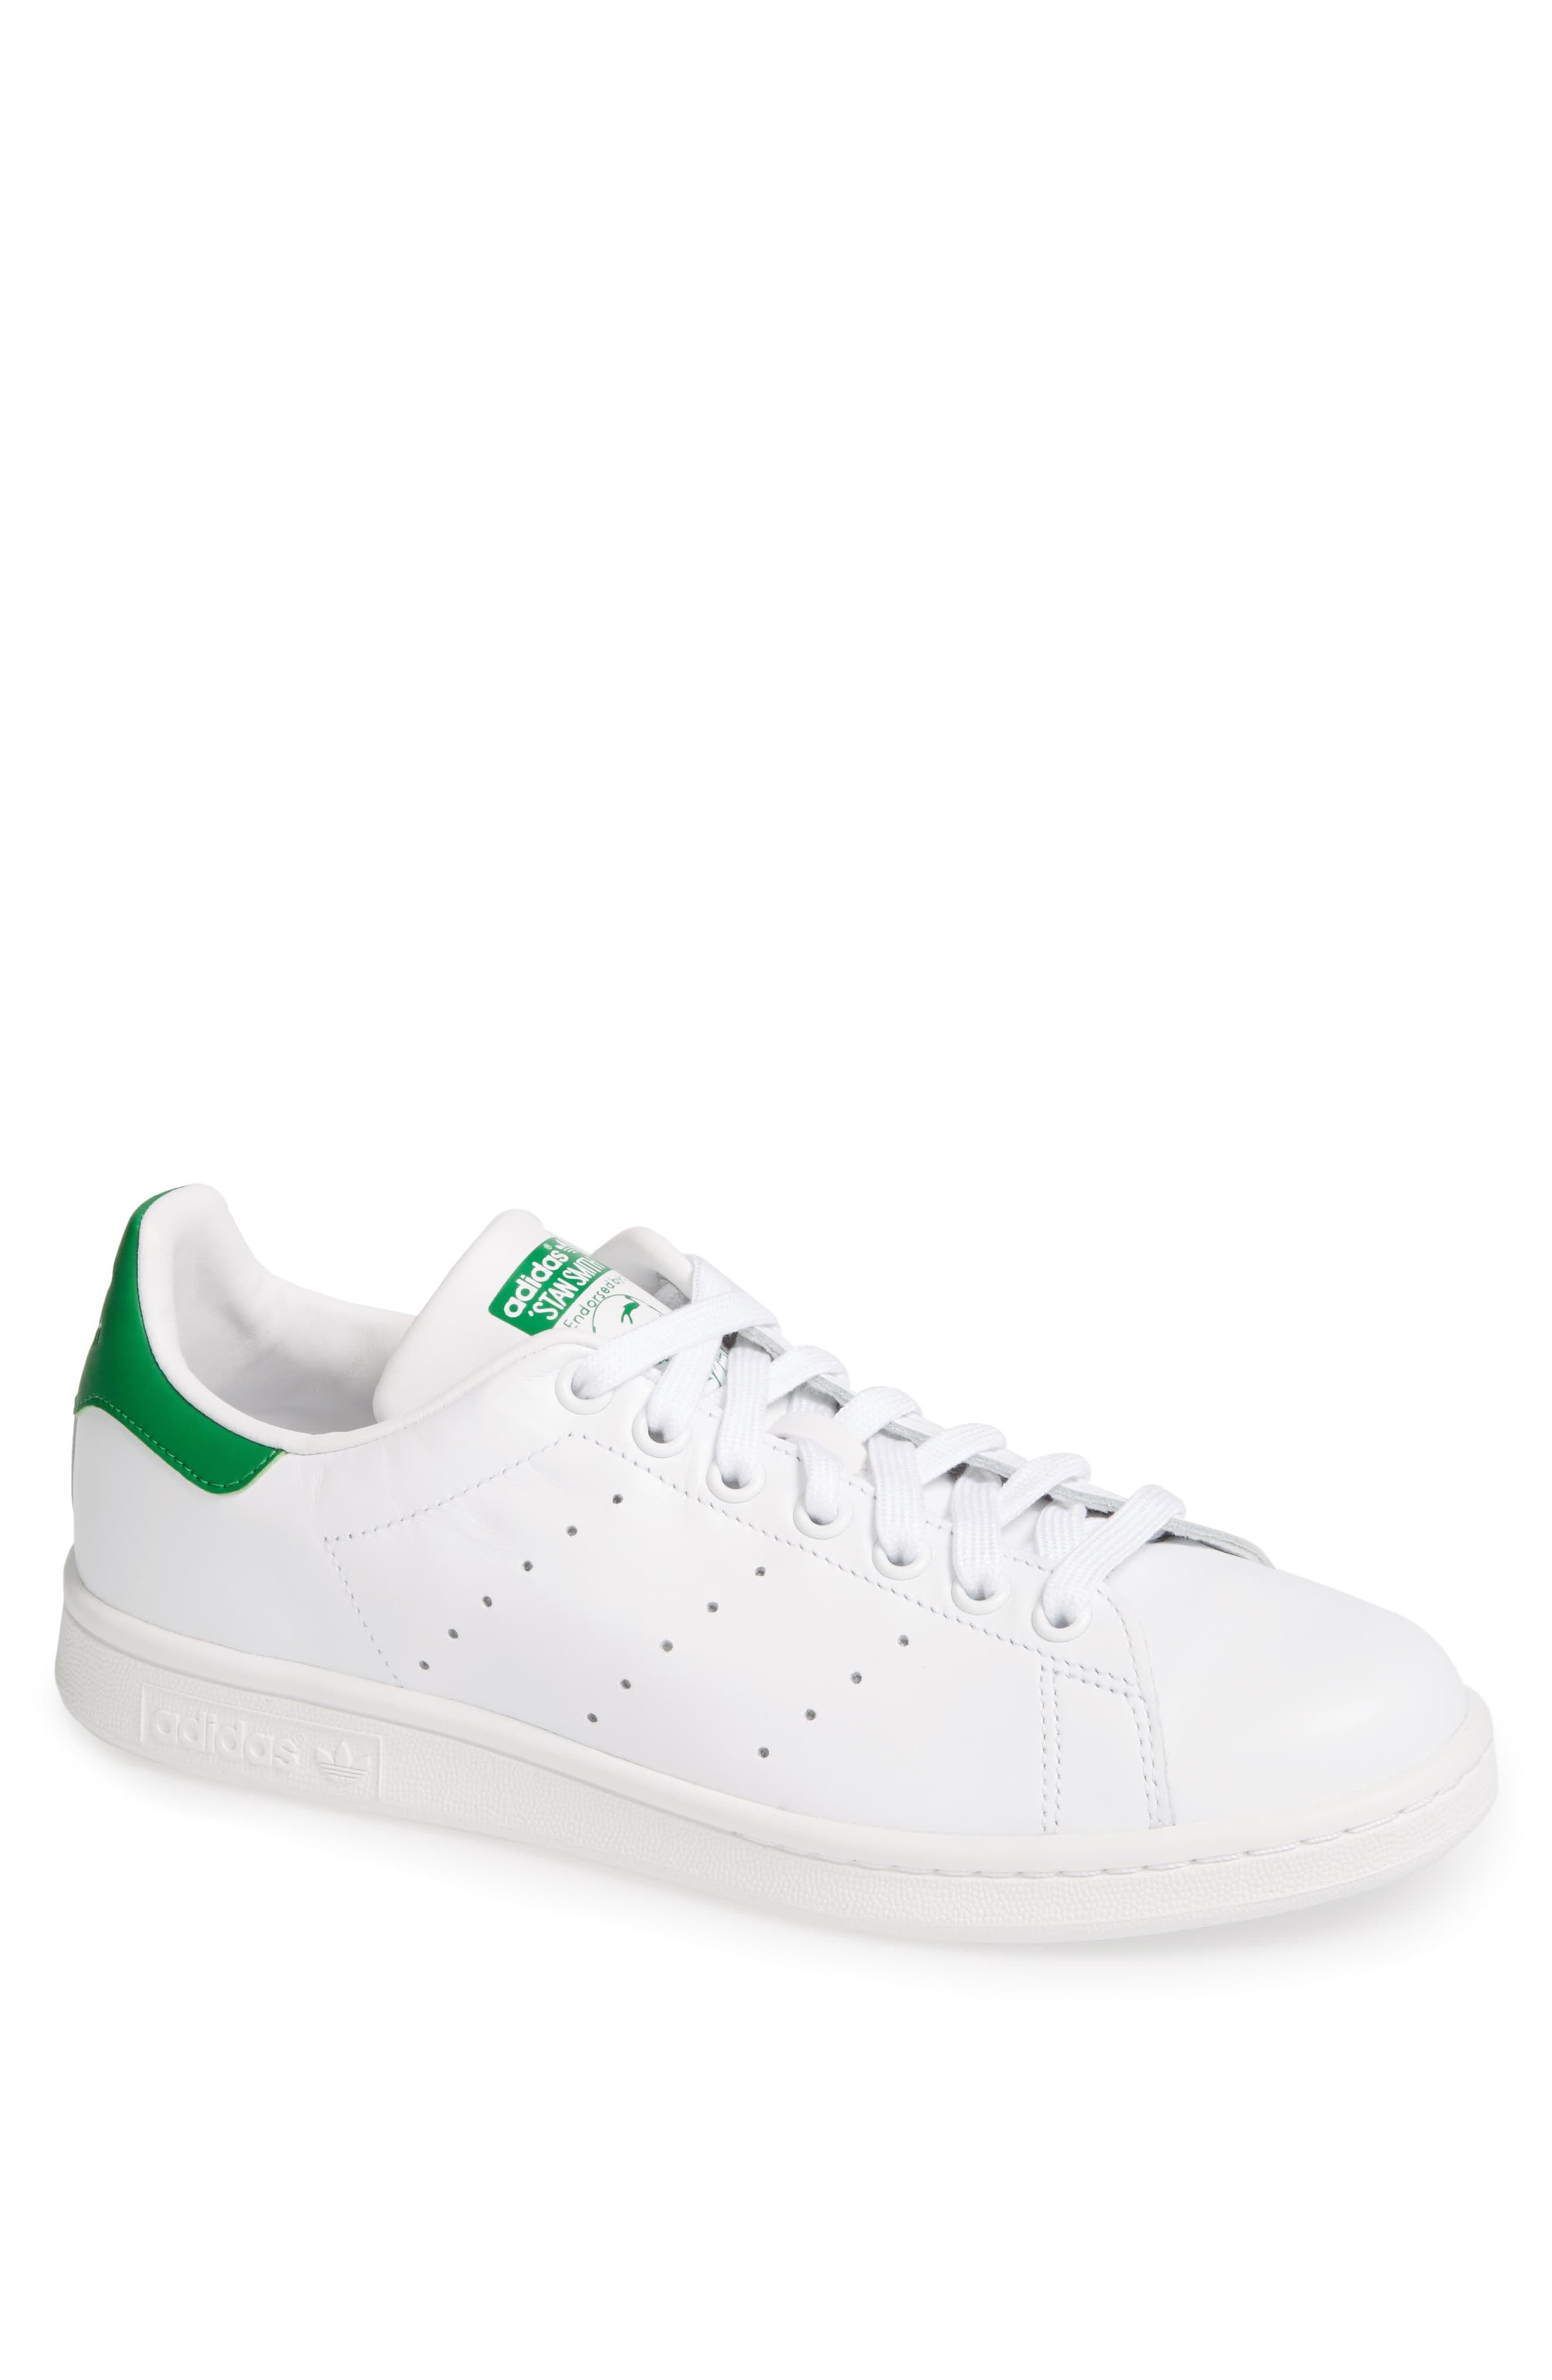 adidas stan smith mens size 12